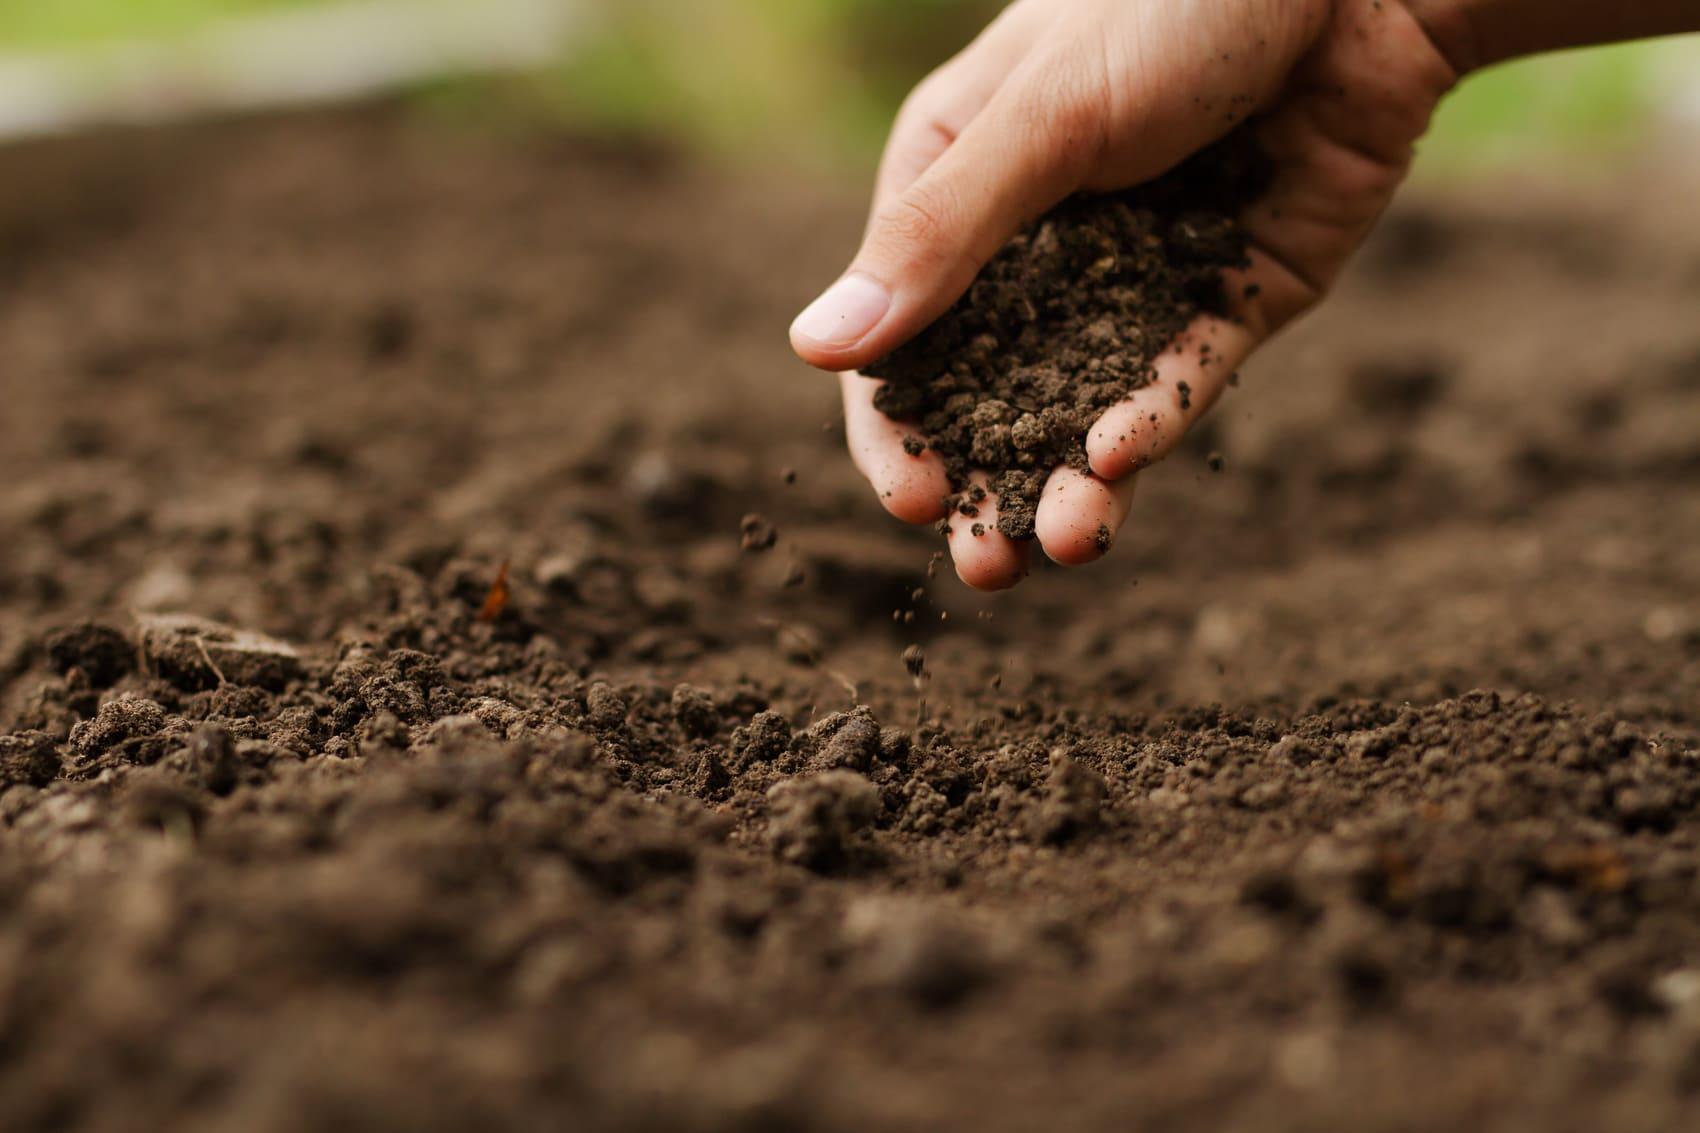 Agricoltura rigenerativa